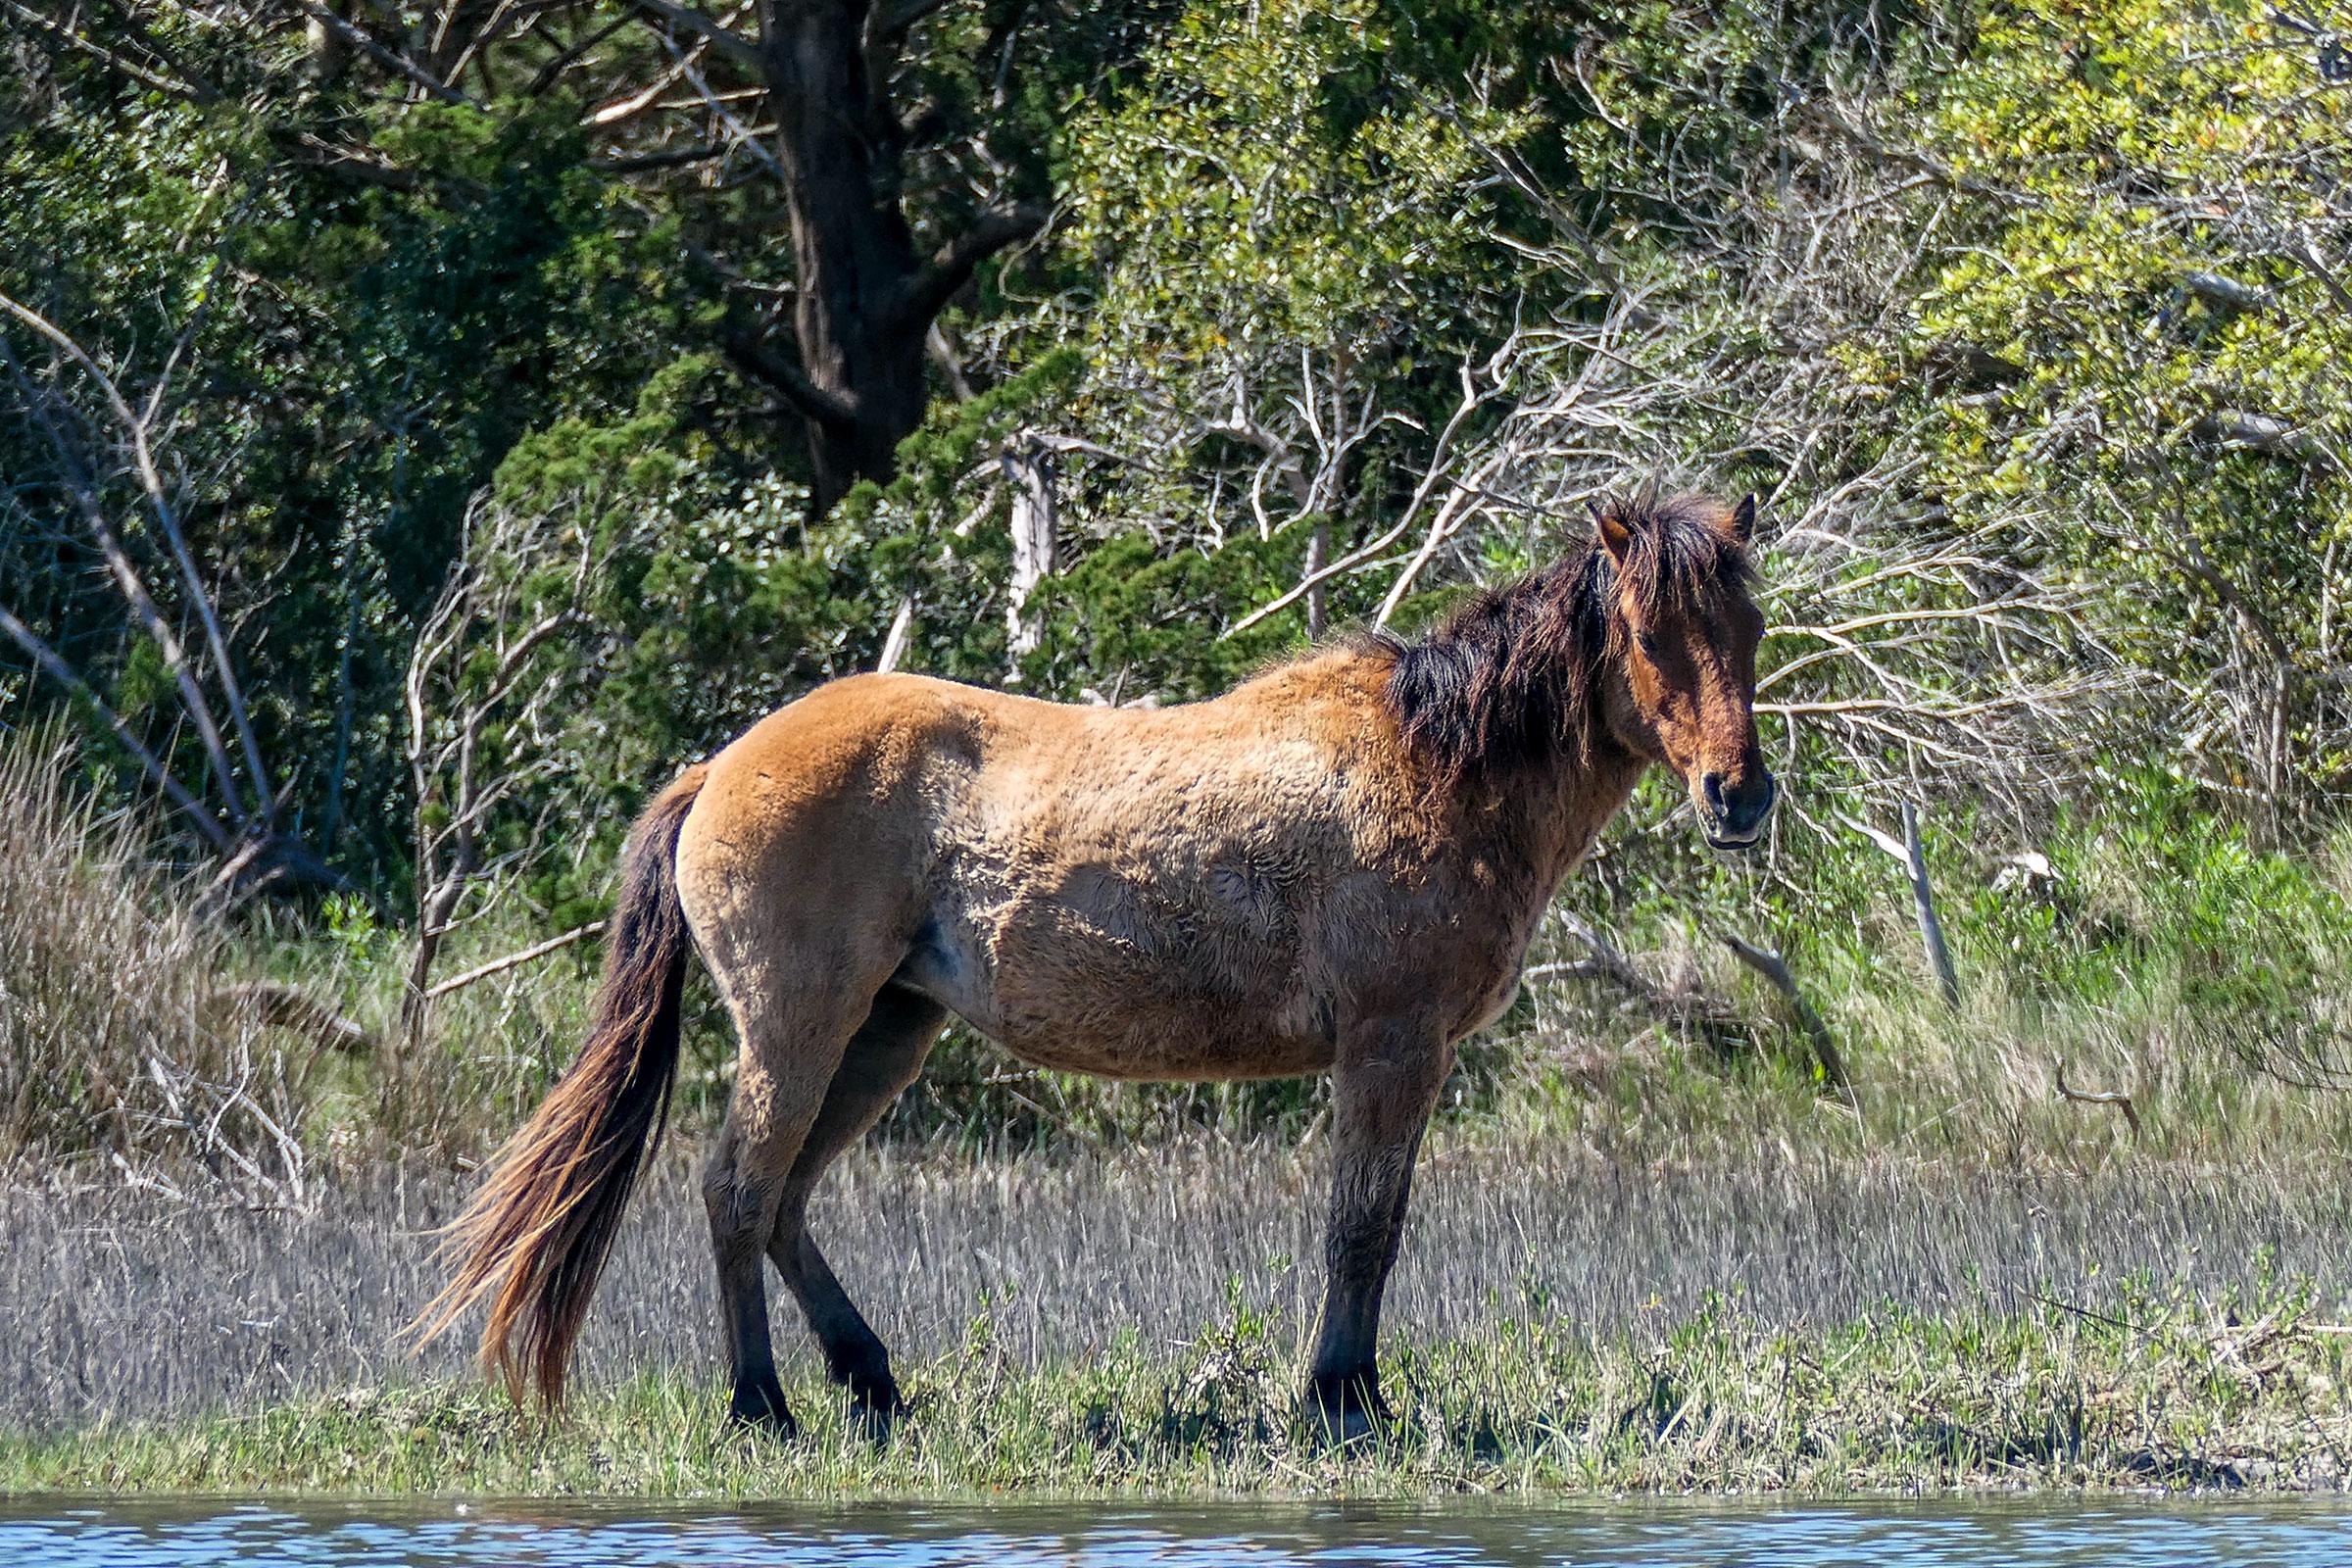 Descended from Spanish stock loosed in shipwrecks long ago, wild horses still inhabit Carrot Island. Megan Mayhew Bergman